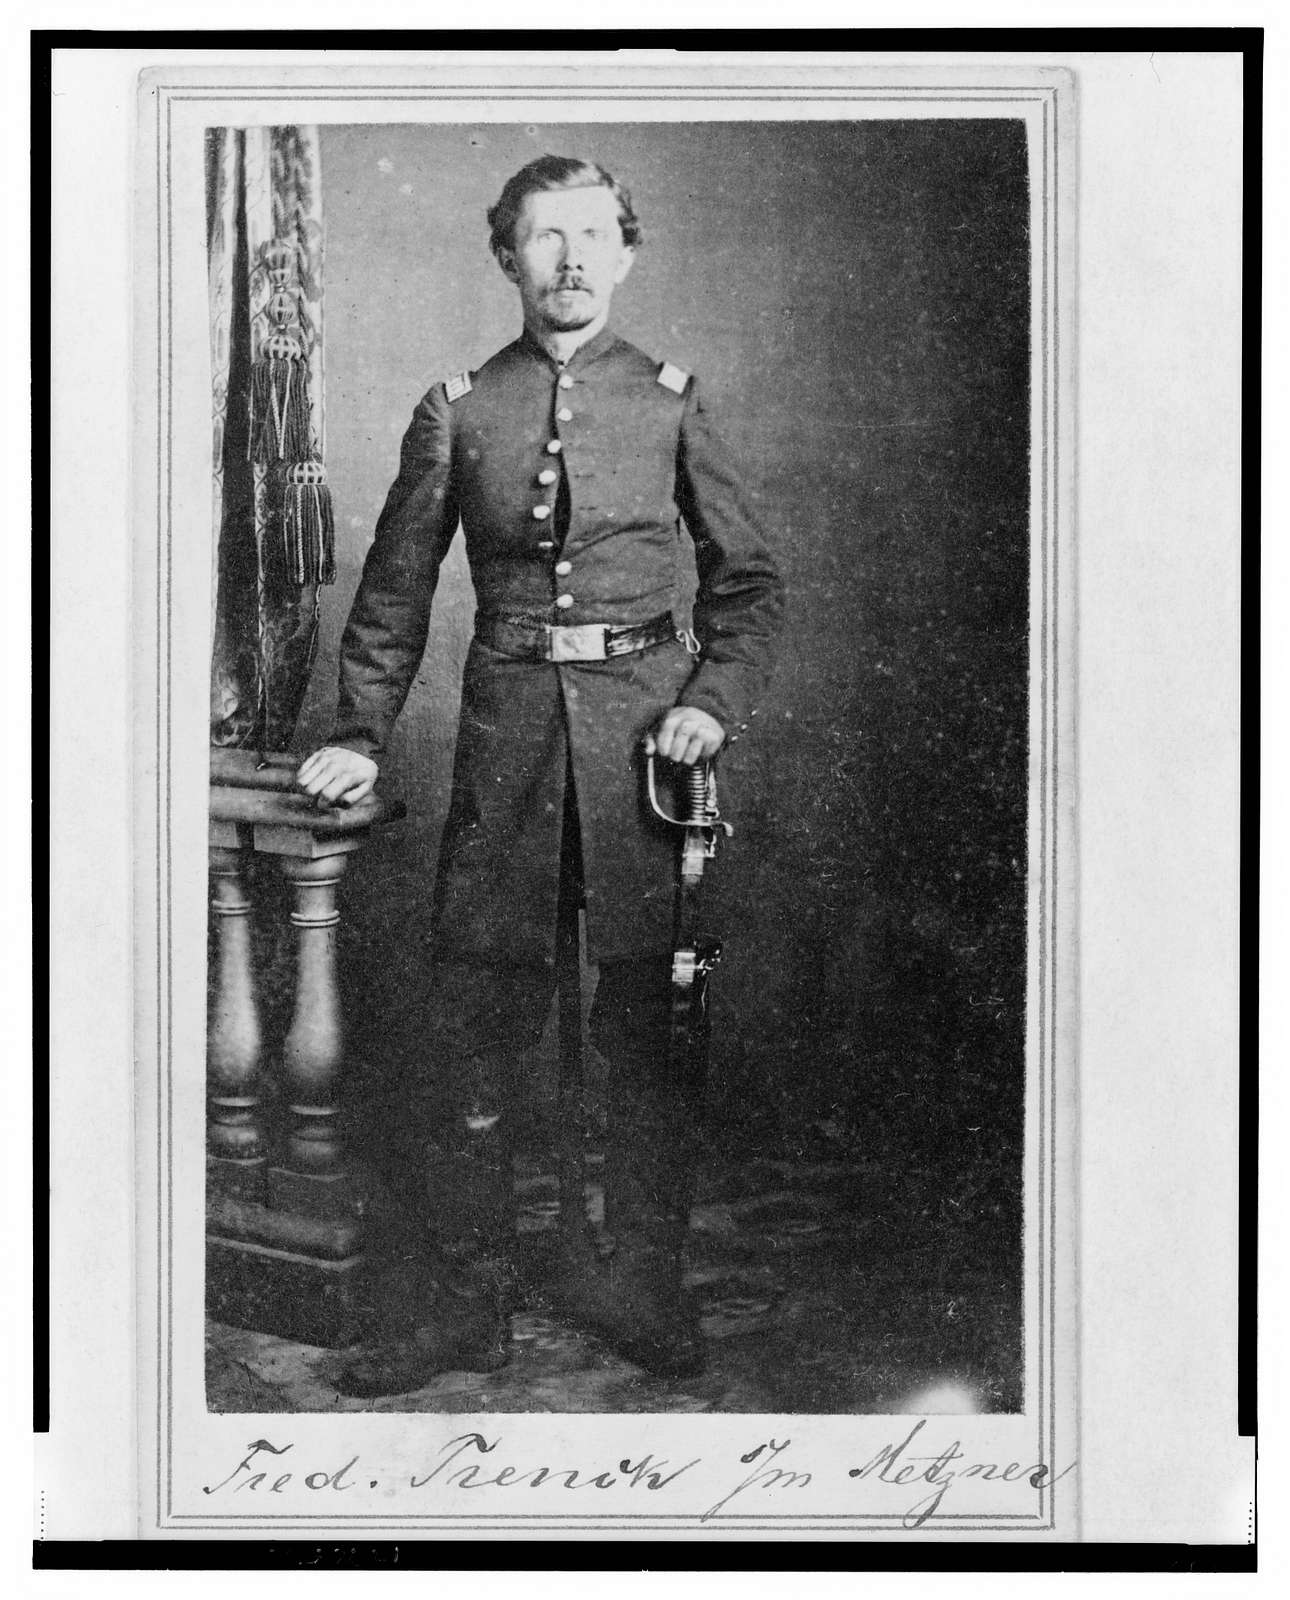 "[Captain Frederick ""Ned"" Trenk (Trenck), Union officer in the 32nd Indiana Regiment, full-length portrait, standing, facing front] / T.M. Schleier's Cartes de Visite Photograph Gallery, Nashville, Tenn."